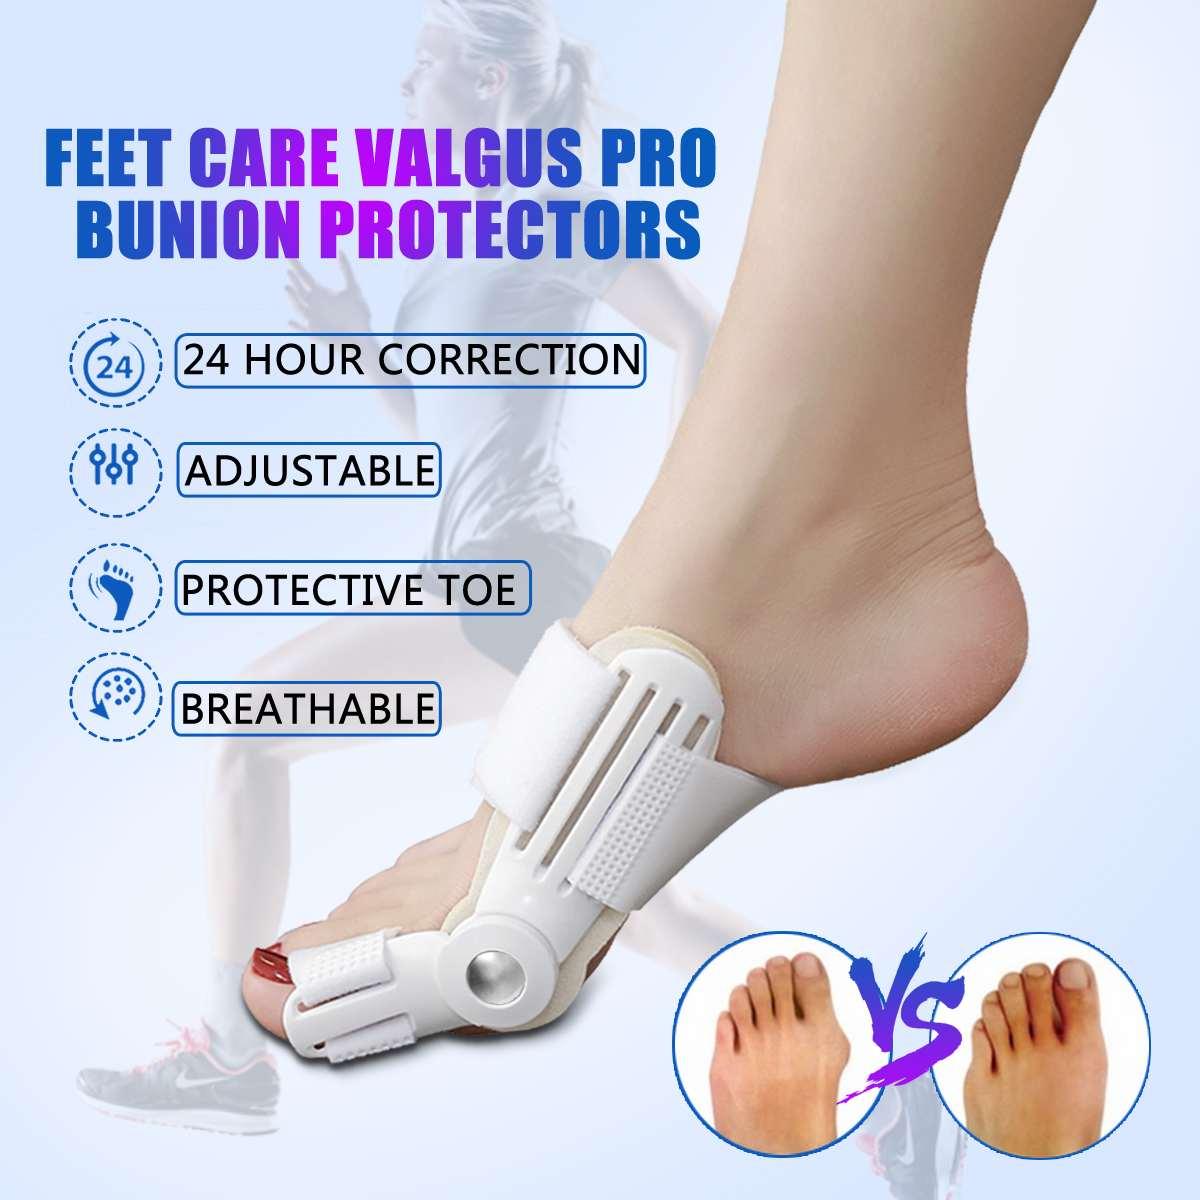 1Pcs Bunion Protector Feet Care Orthotics Pedicure Tool Hallux Valgus Corrector Orthopedic Adjuster Bunion Foot Massager